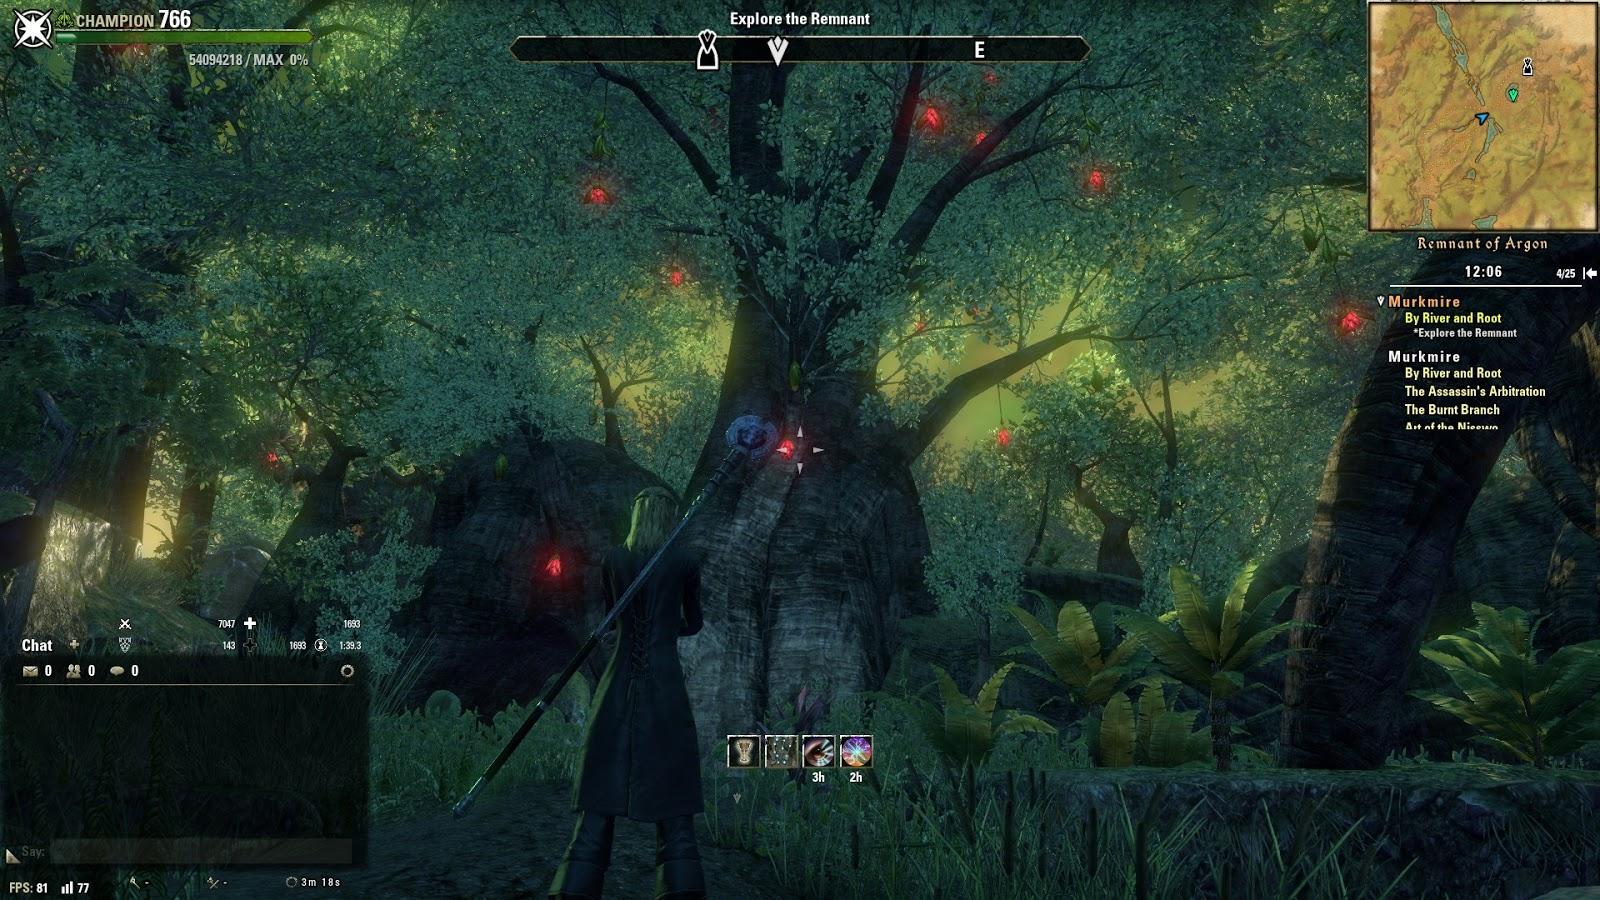 Nerdy Girl: Elder Scrolls Online: Happy 5 Year Anniversary! Here's a